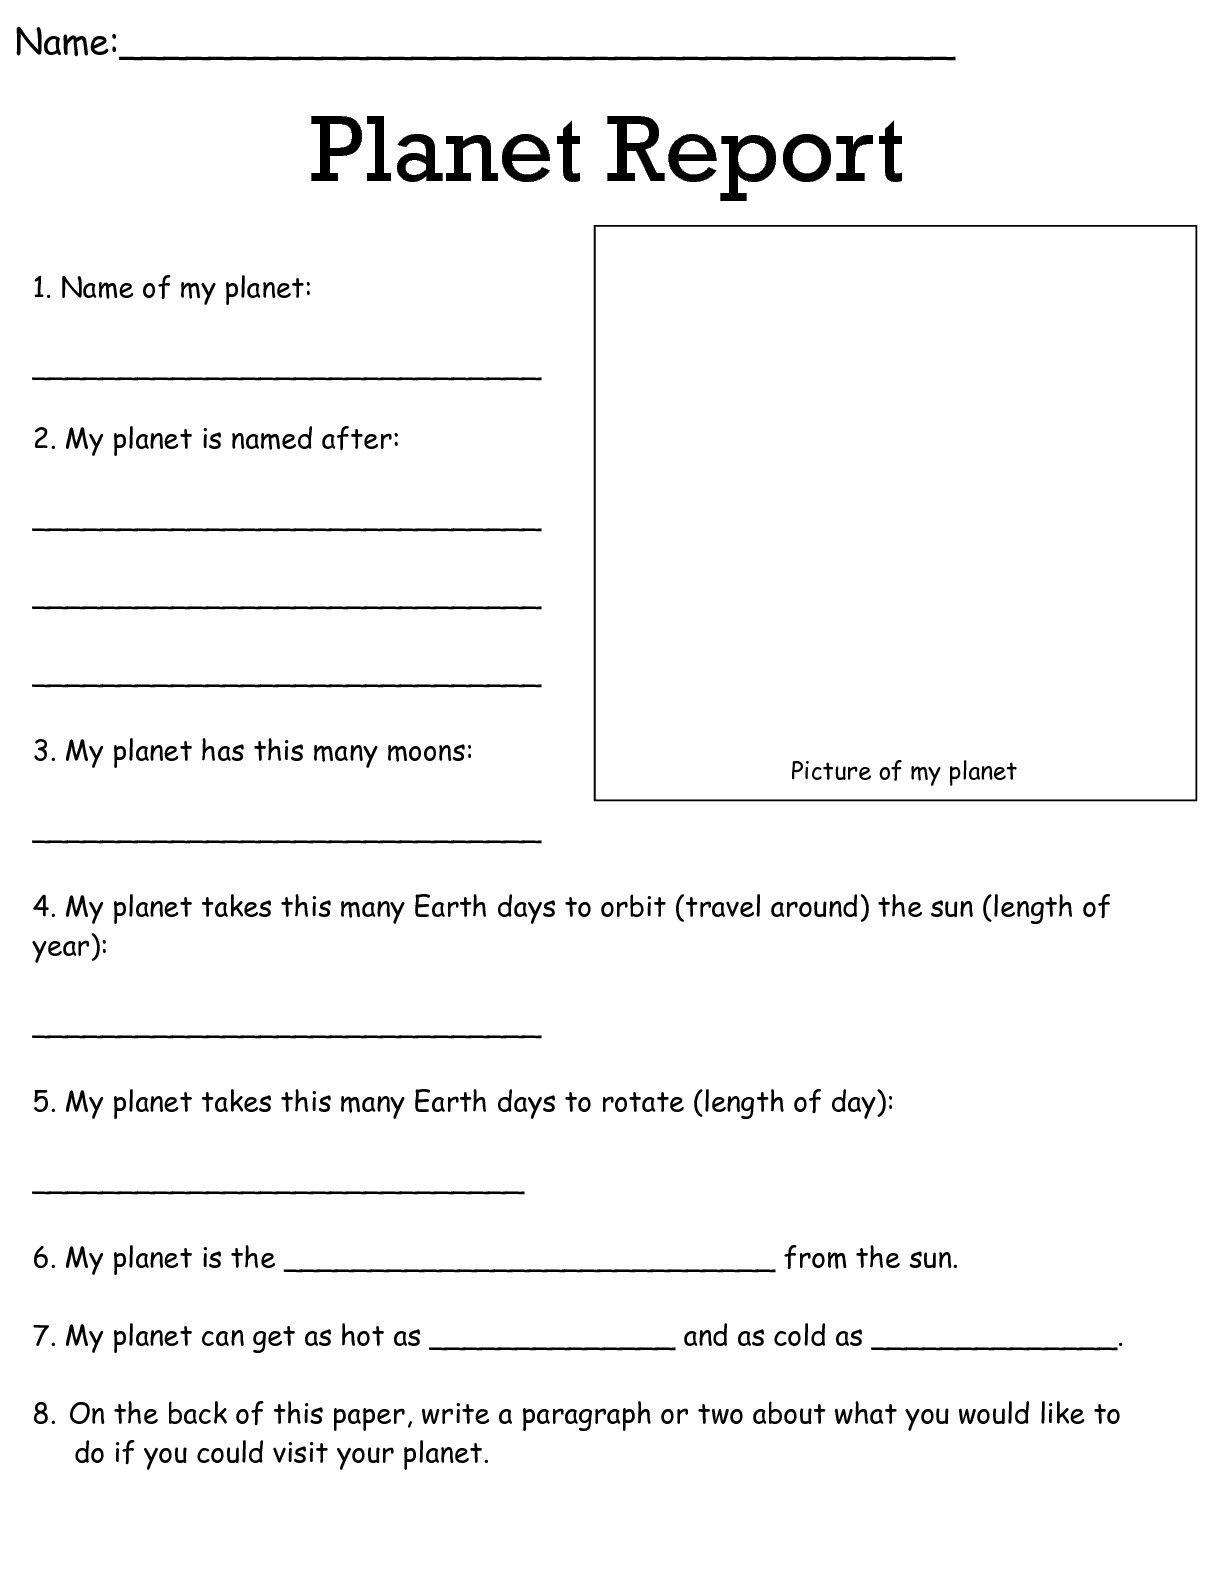 Job Worksheets 5Th &6Th | Science Worksheets Science Worksheets | 6Th Grade Writing Worksheets Printable Free